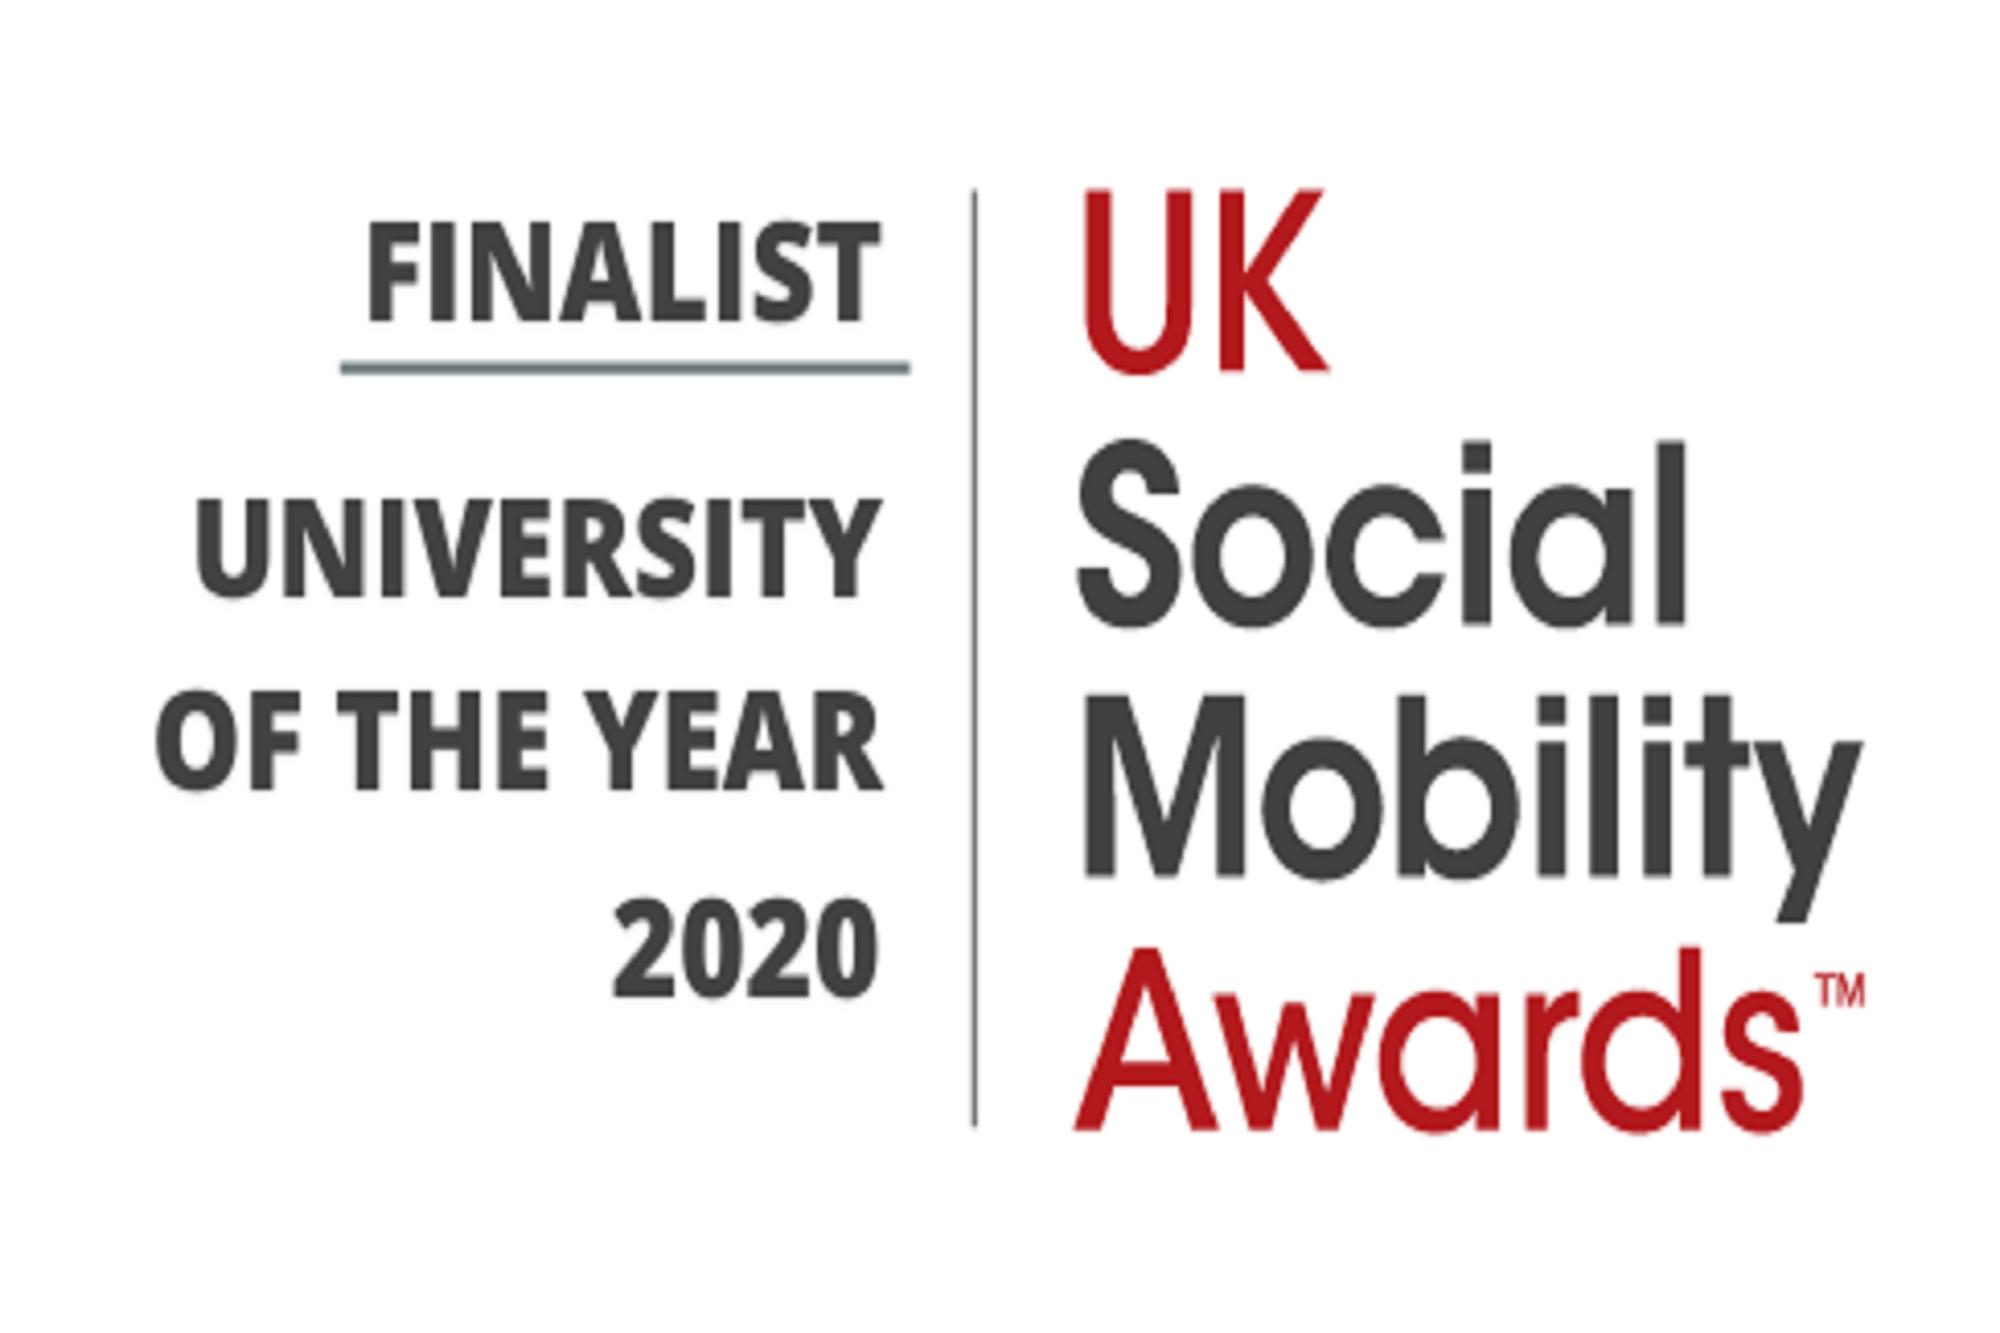 UK Social Mobility Awards finalist logo